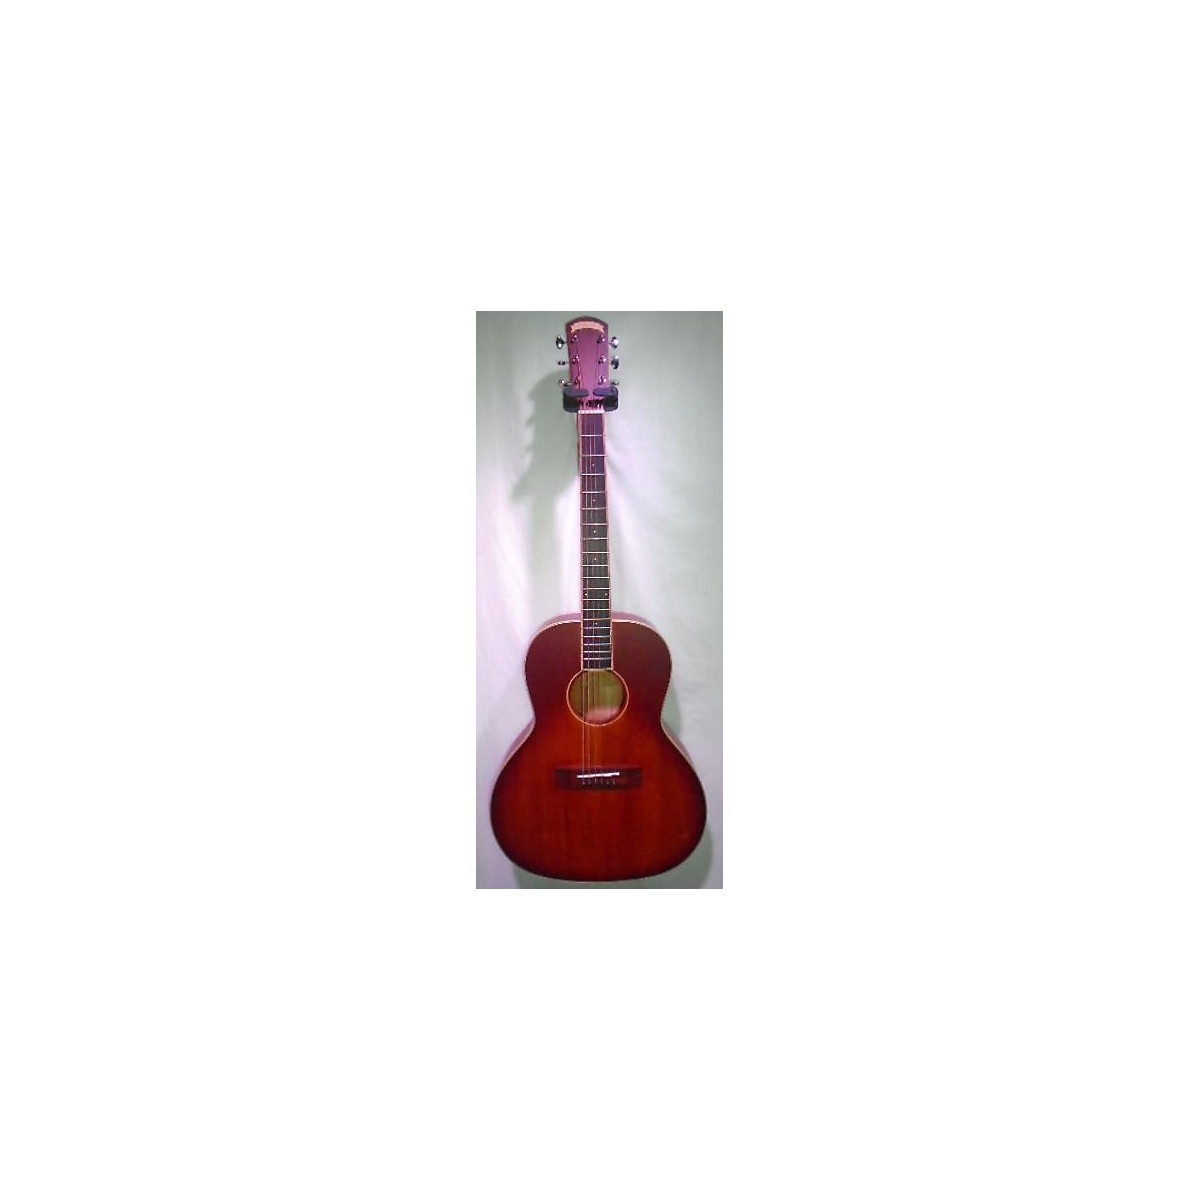 Morgan Monroe MV-01 Acoustic Guitar